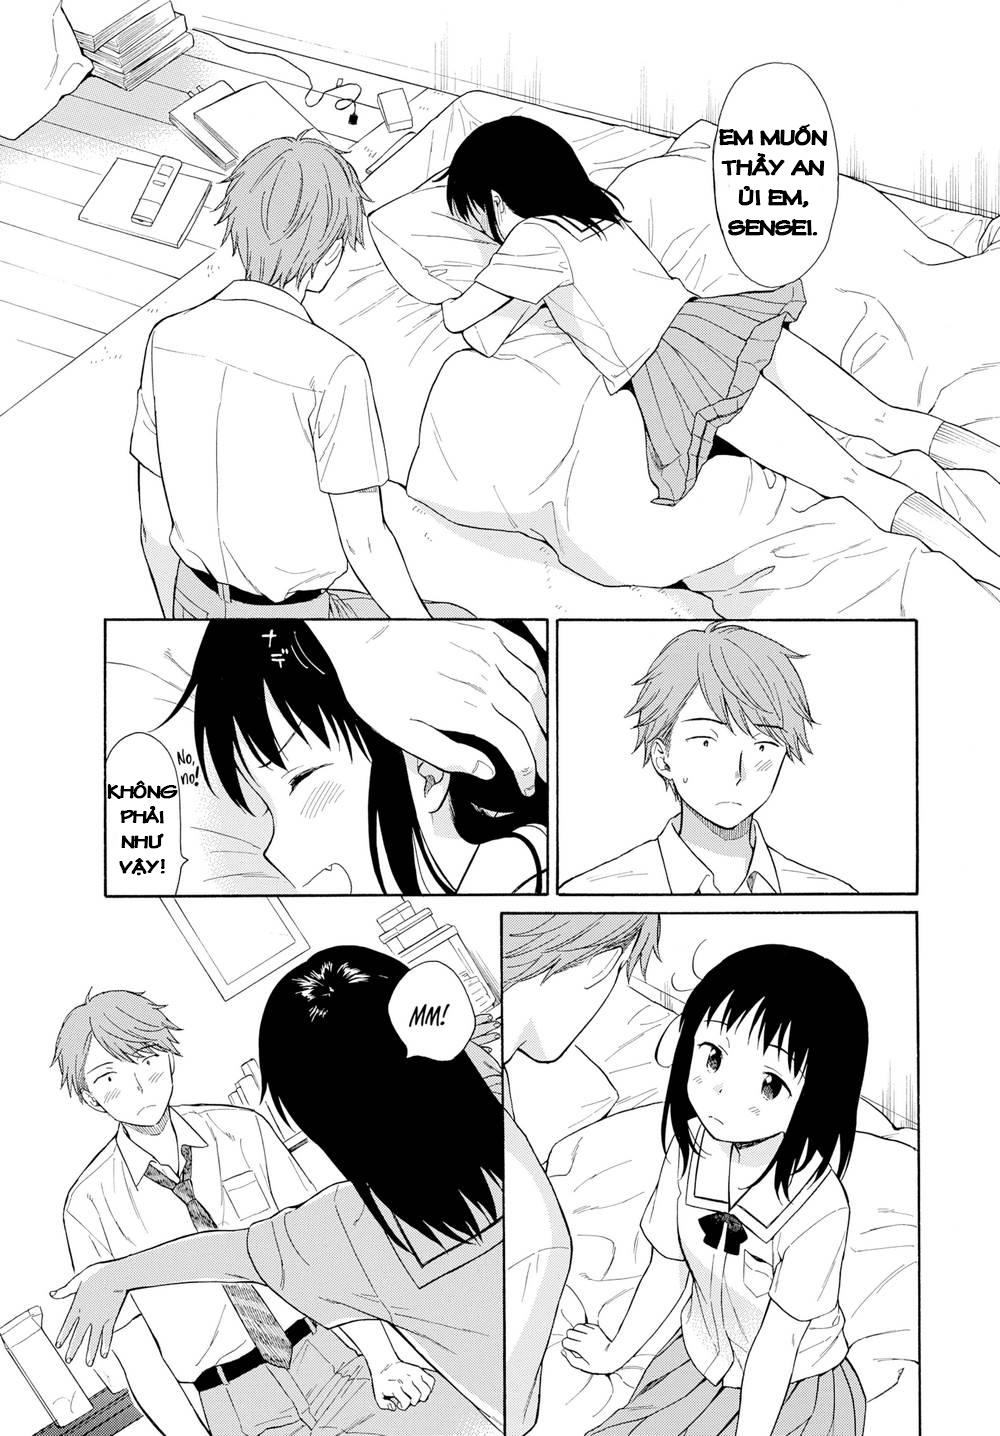 HentaiVN.net - Ảnh 9 - Em yêu thầy 3 - Sensei 3, Sensei Final, Sensei - Oneshot